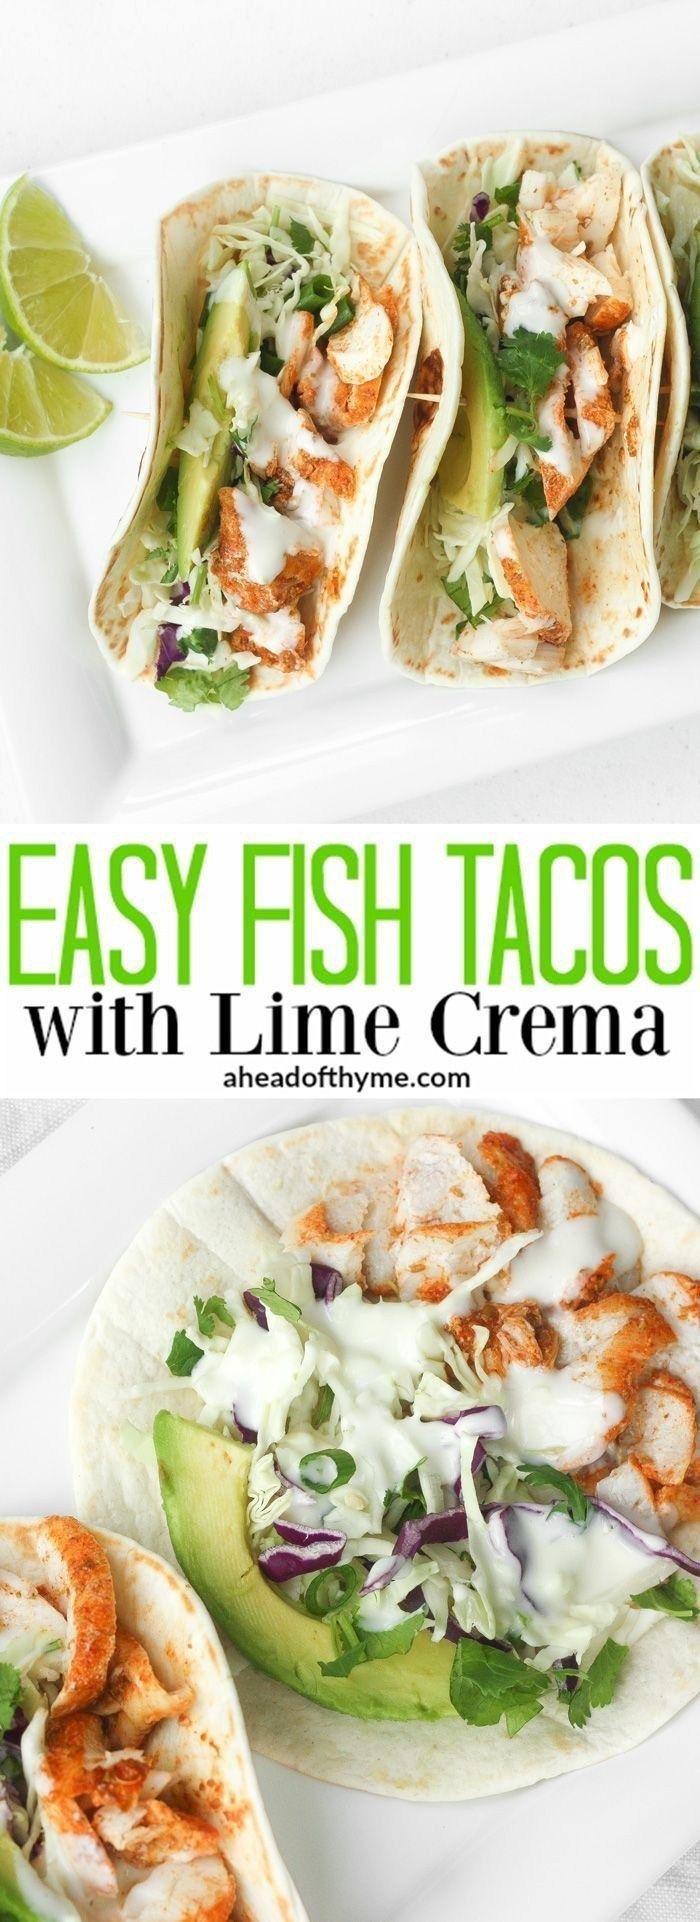 14 Taco Recipes for Taco Tuesday! - Tasteful Tavern #tacotuesdayrecipes